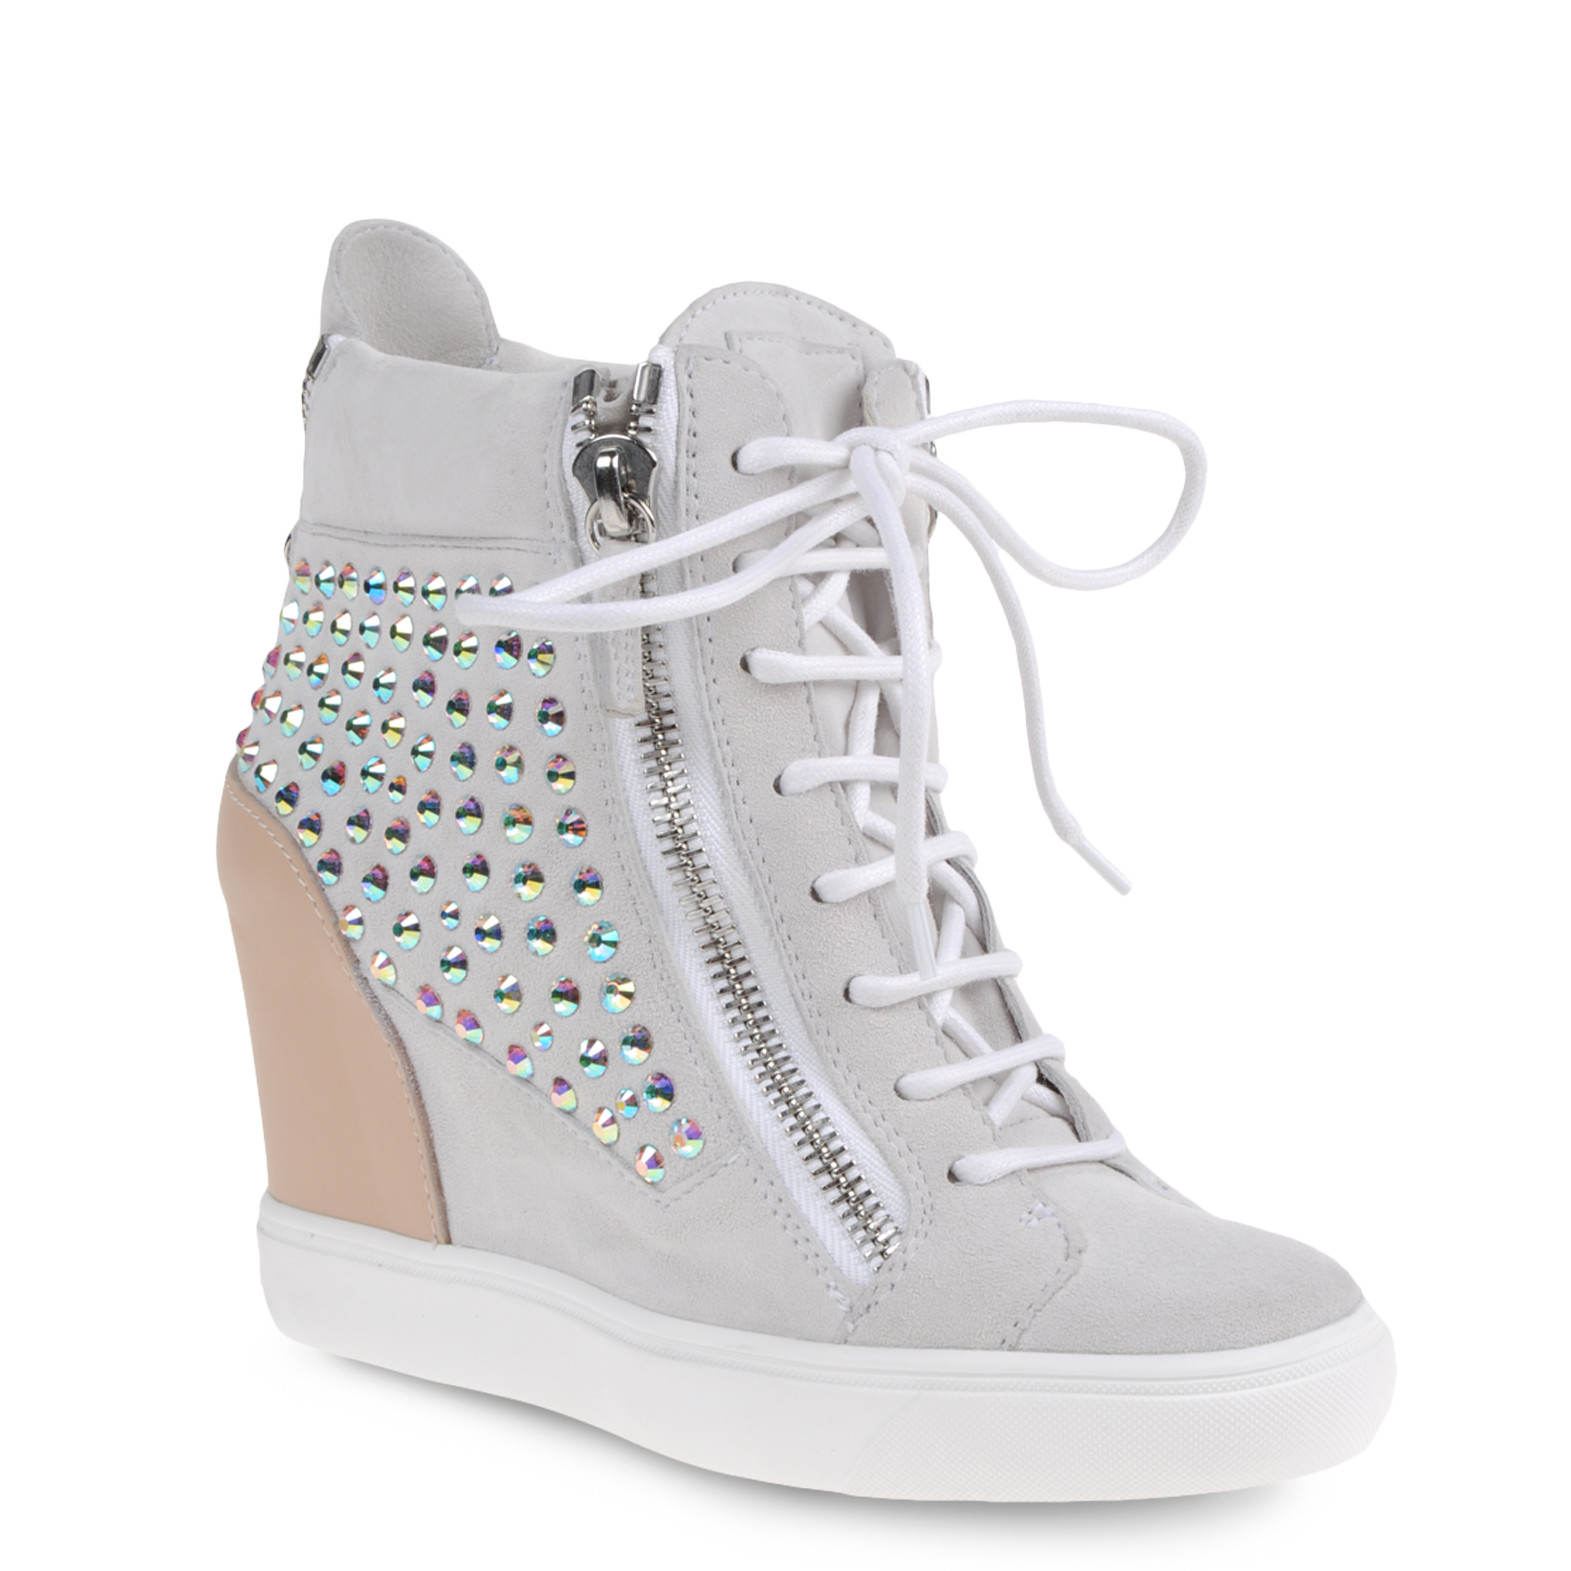 http://1.bp.blogspot.com/-Ha5hvUP09Vo/T59s2koZ9wI/AAAAAAAABj8/3wbpTEfpQIs/s1600/Giuseppe-Zanotti-women-high-top-sneakers-in-white-suede-and-sand-calfskin-1.jpg